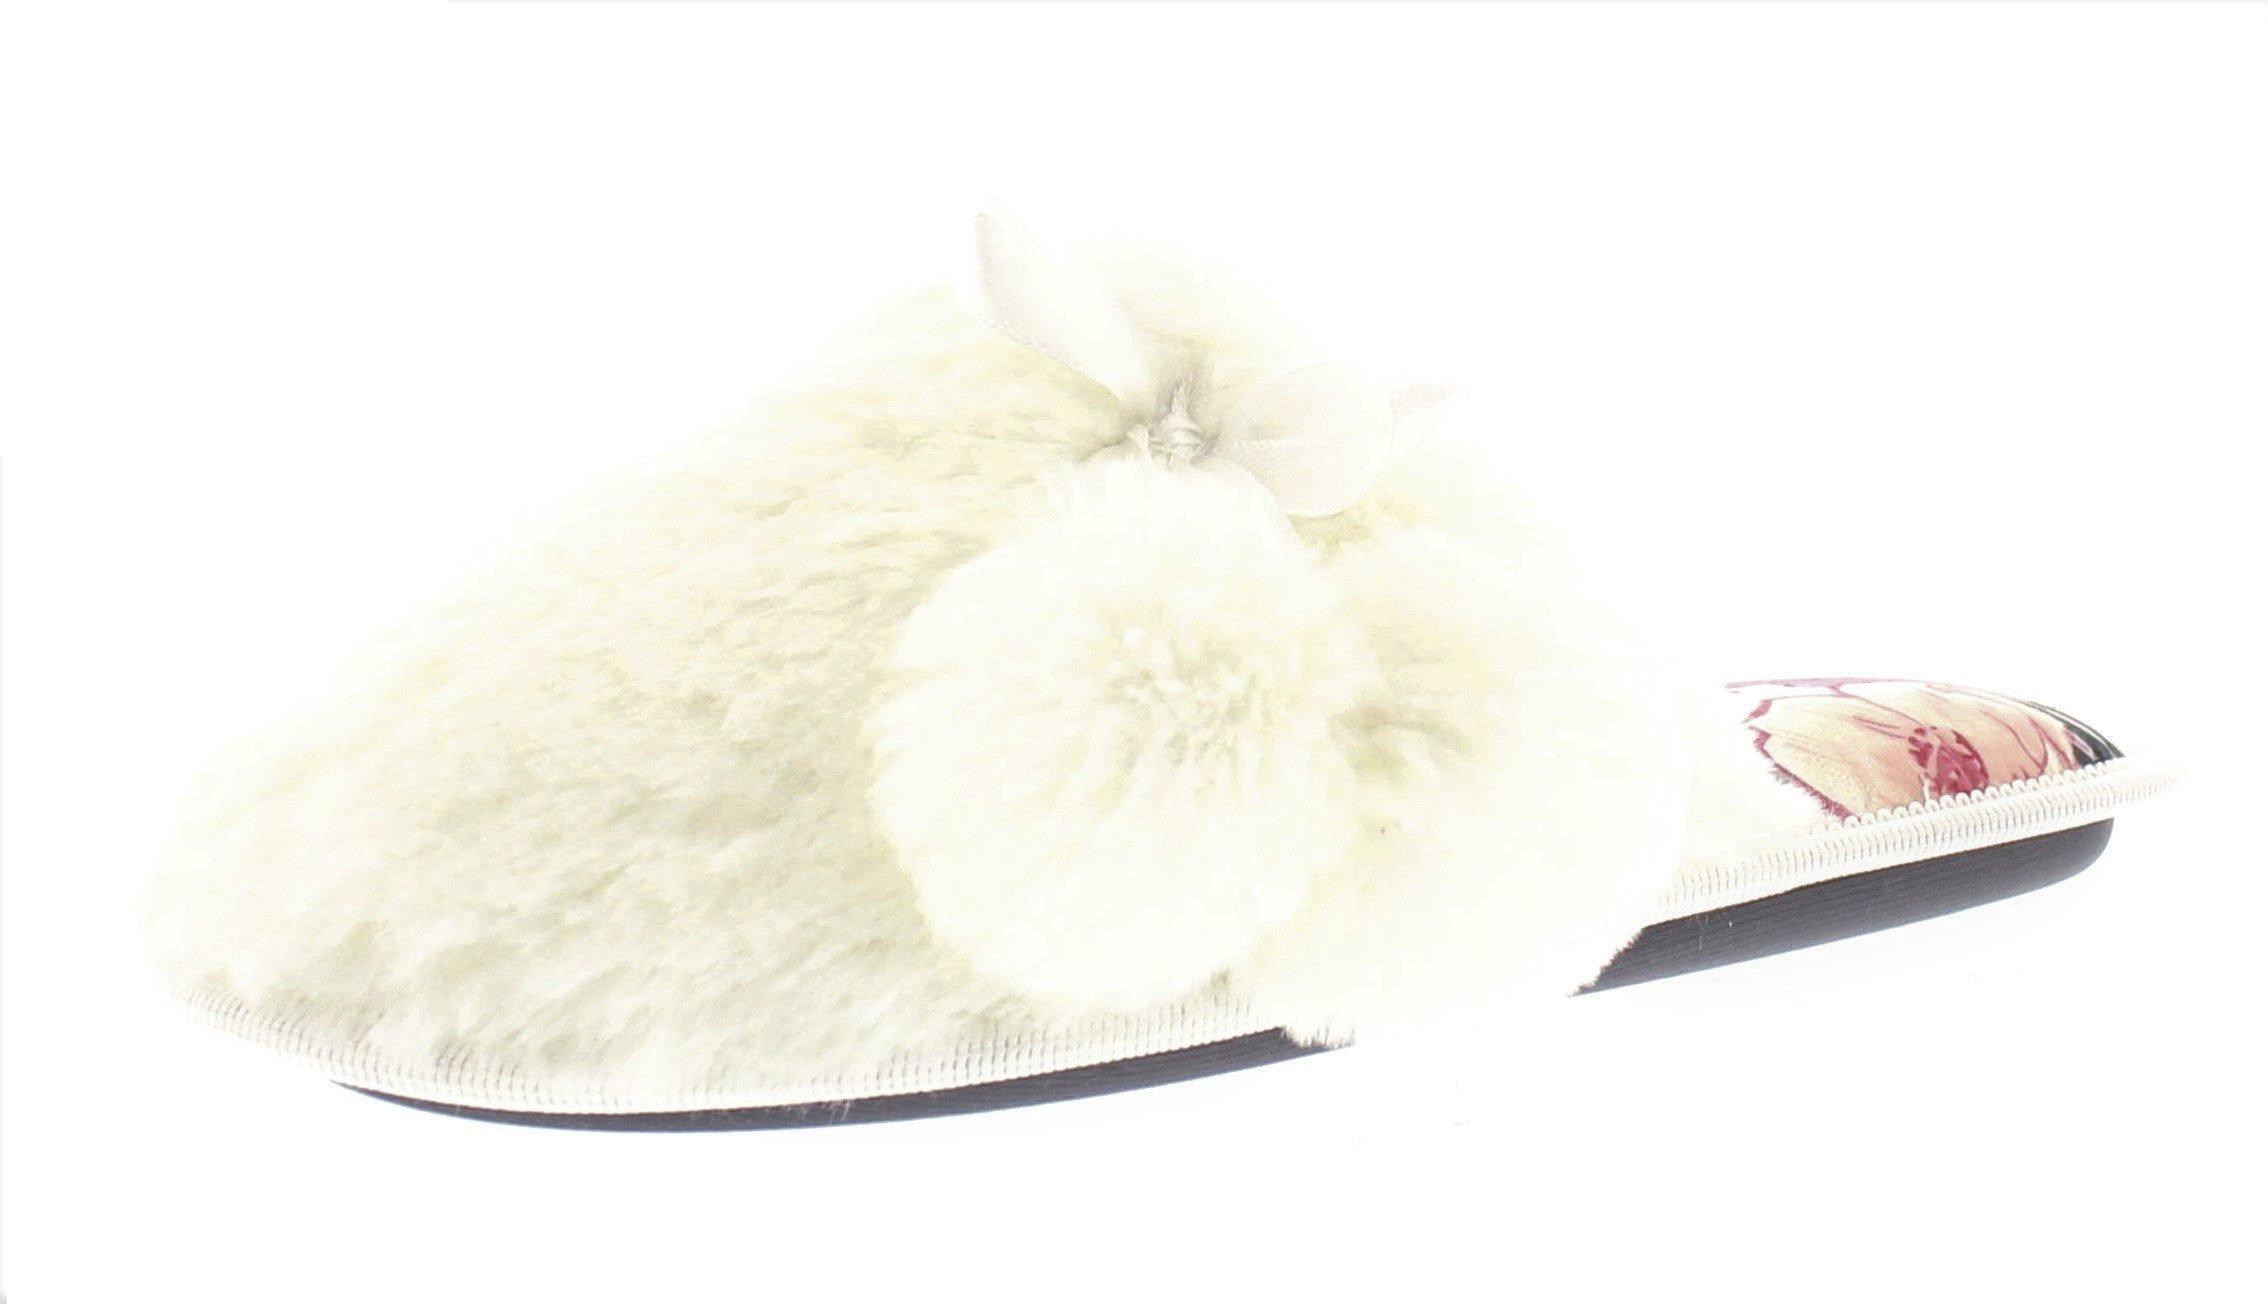 Gold Toe Women's Arabelle Fuzzy Pom Pom Memory Foam Slip On House Scuff Slipper with Floral Print Insole Ivory M 8 US